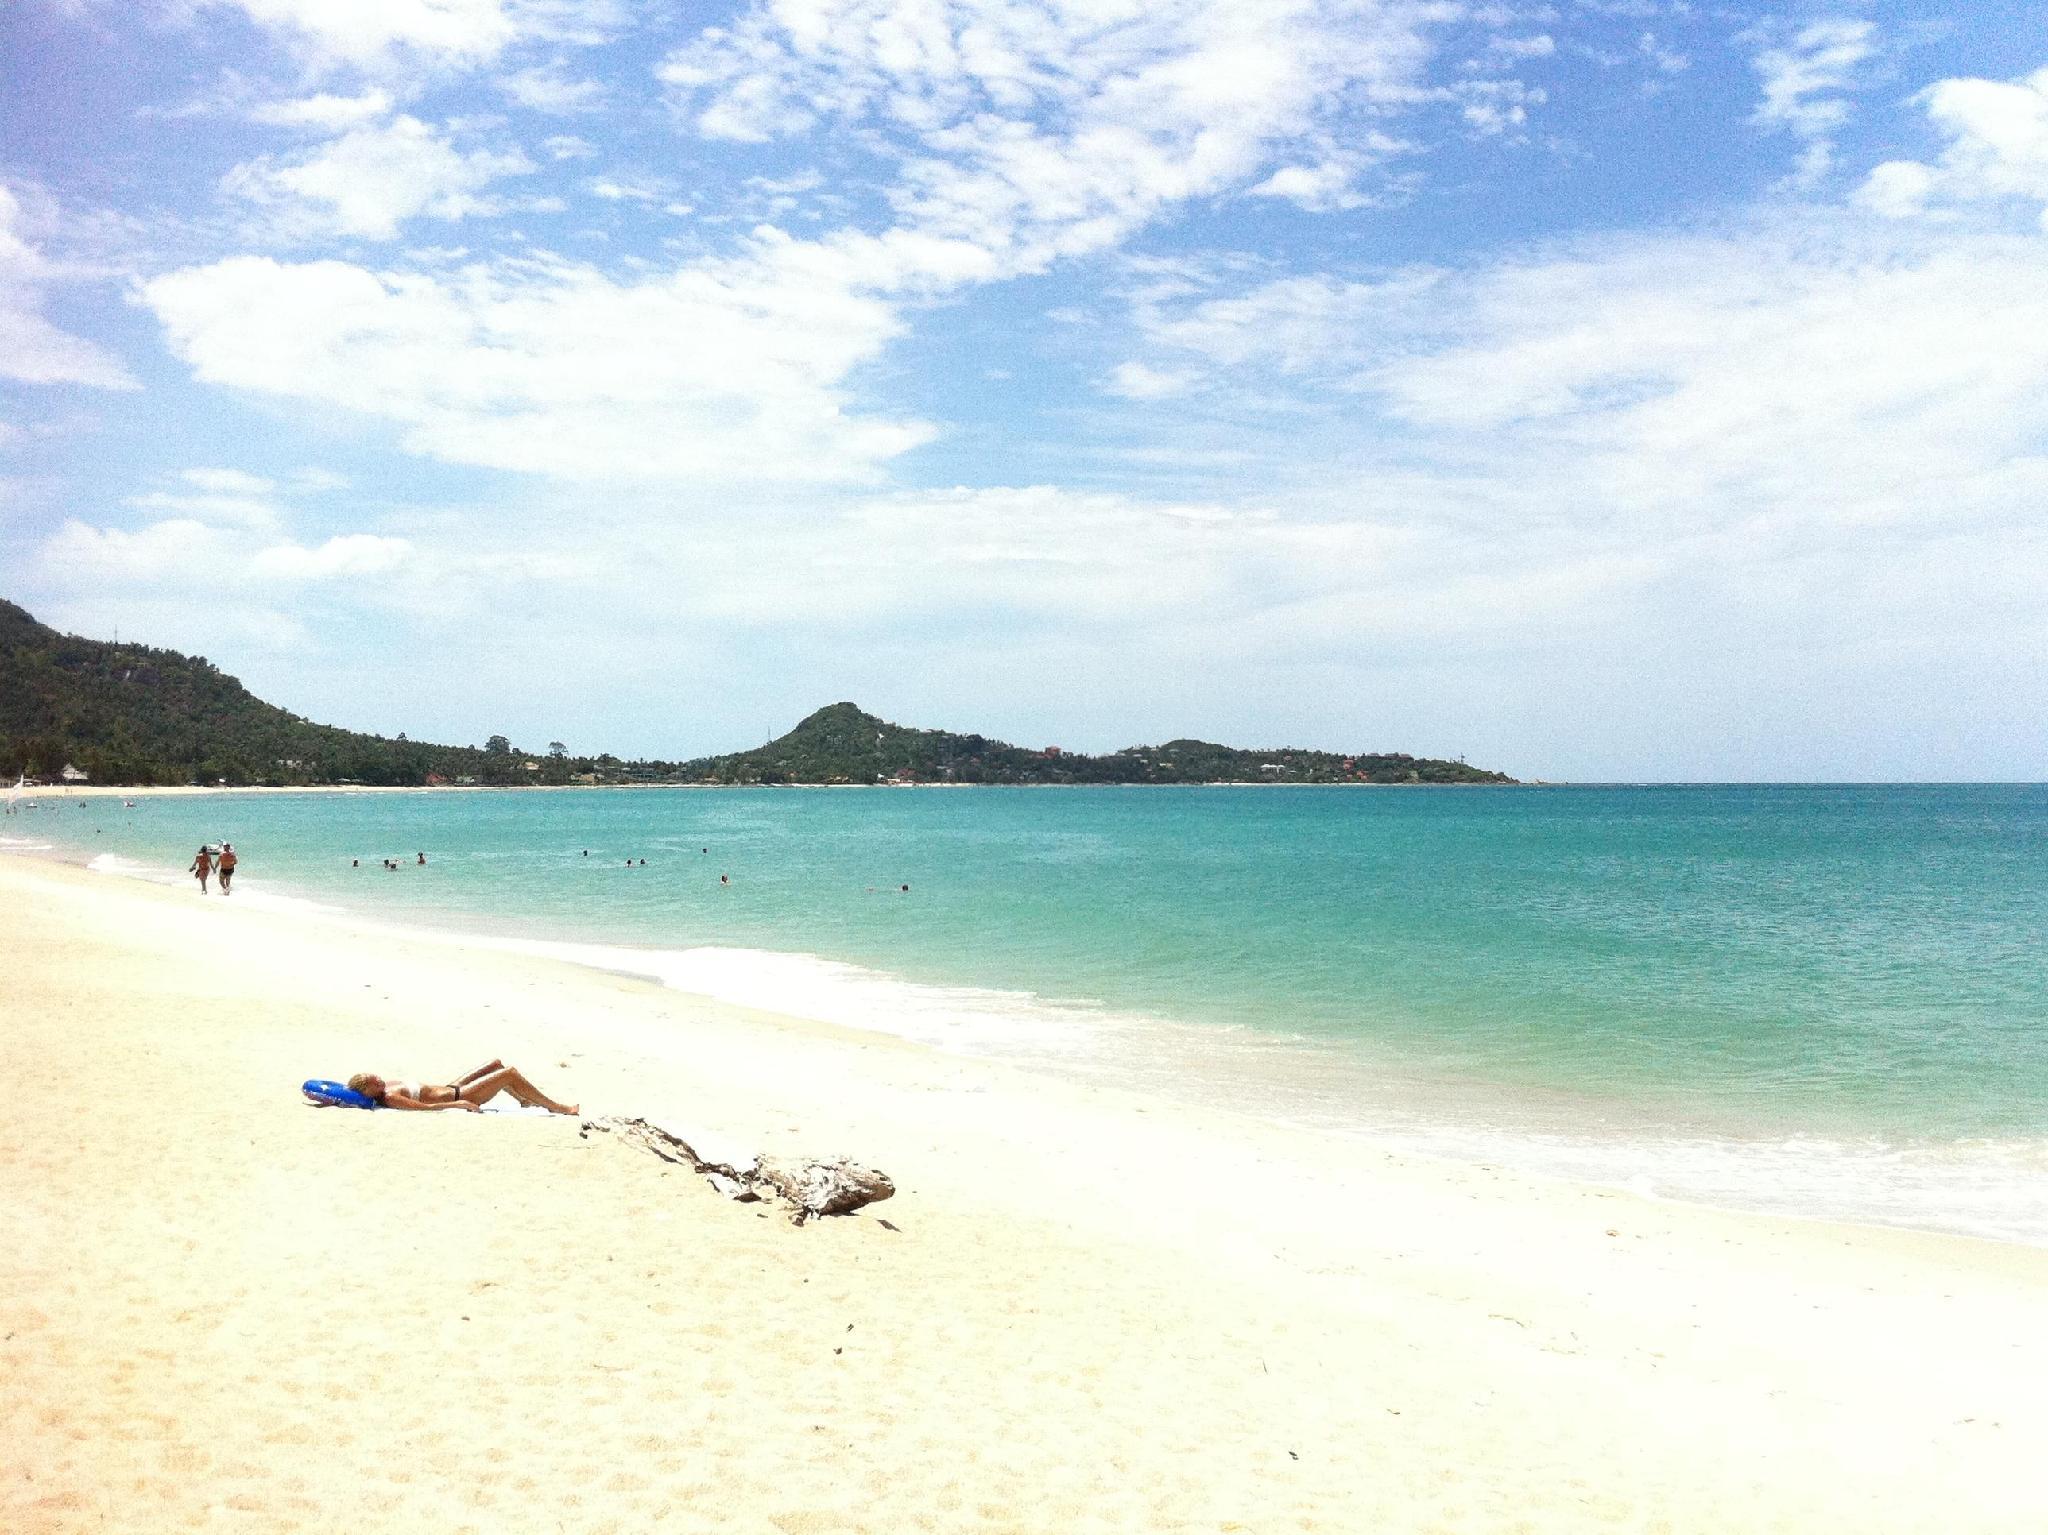 Rich Resort Beachside Hotel Samui - Best location on Lamai Beach